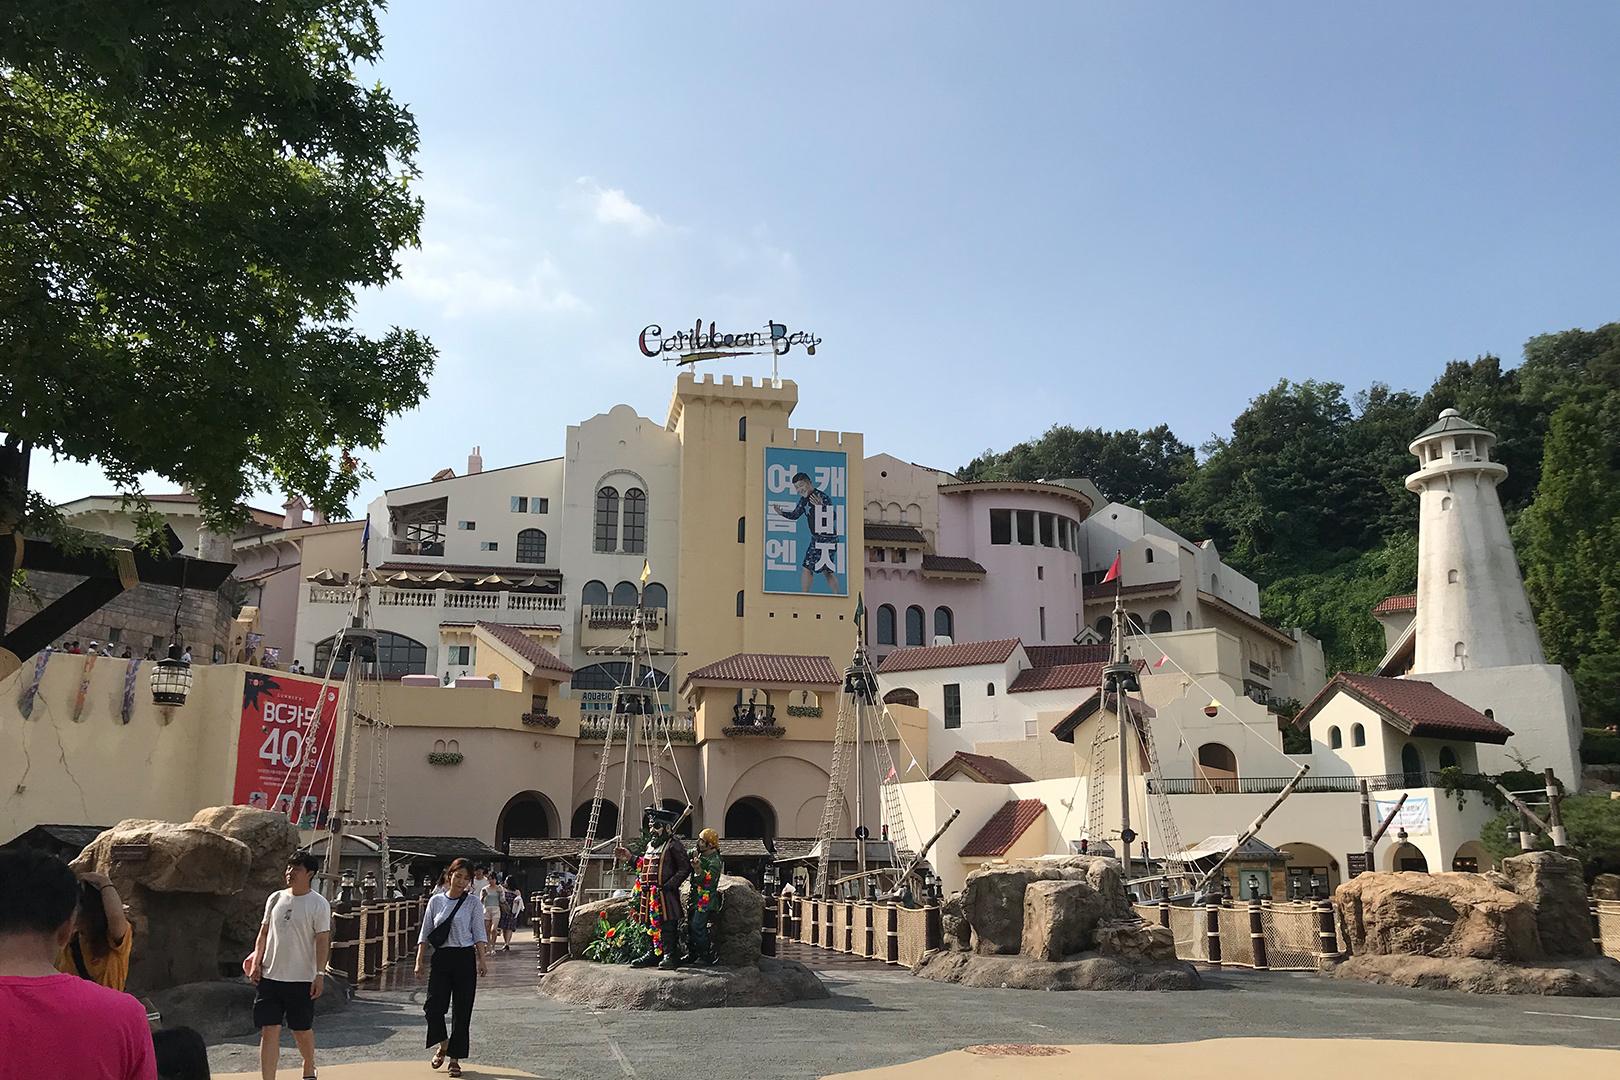 Карибиан Бей «Caribbean Bay» аквапарк в Корее